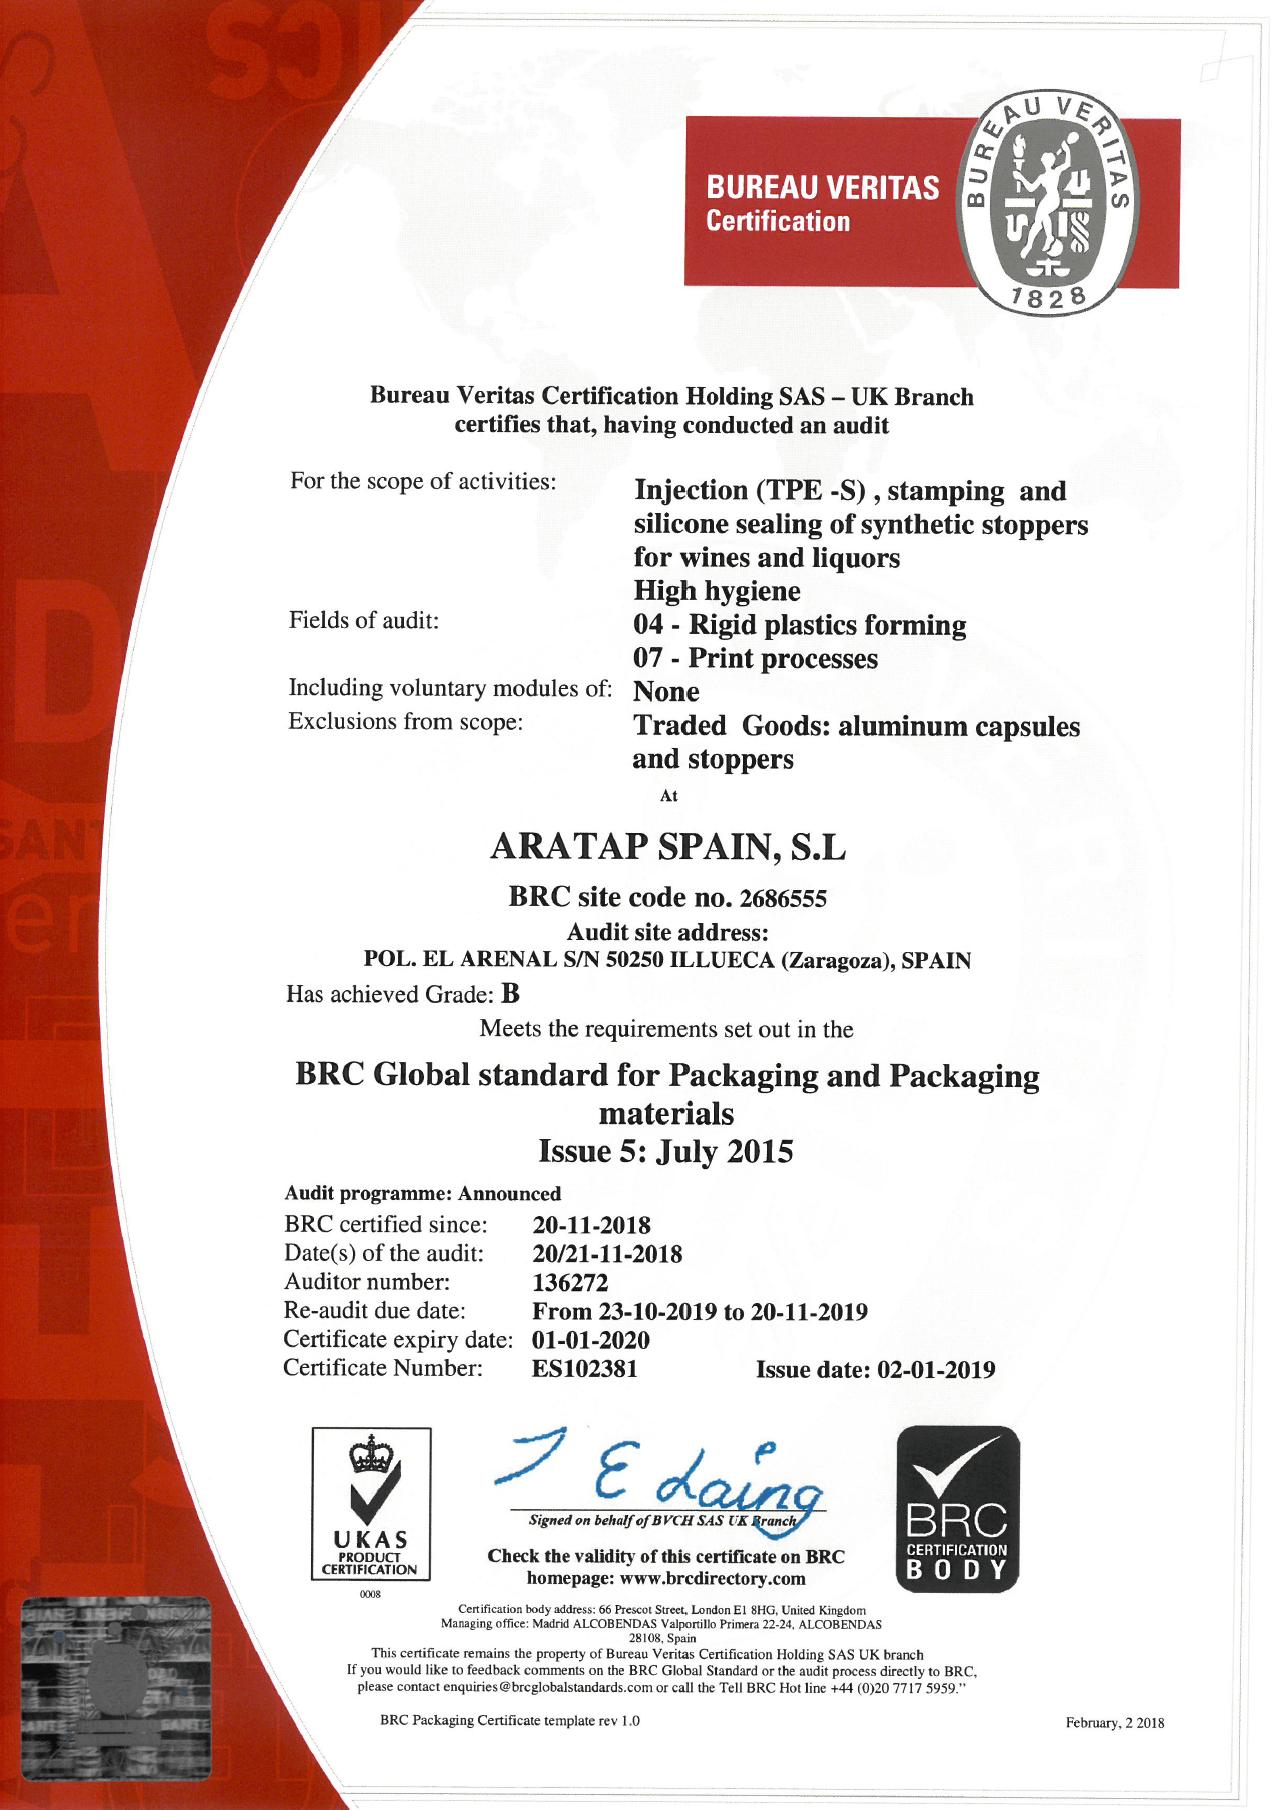 certificado BRC Aratap